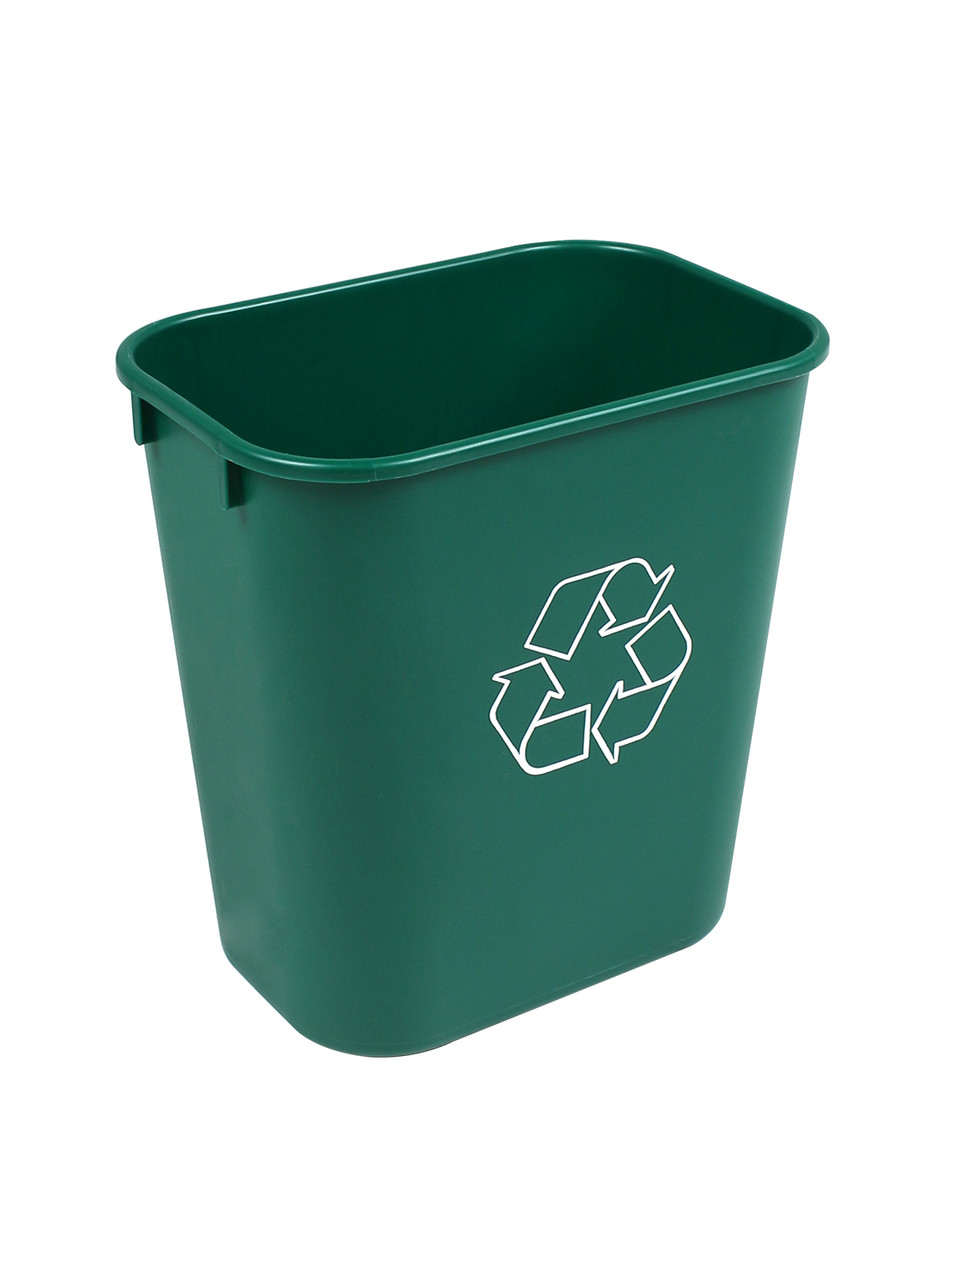 14 Quart Green Kitchen Recycle Wastebasket 14Q (2 Pack)